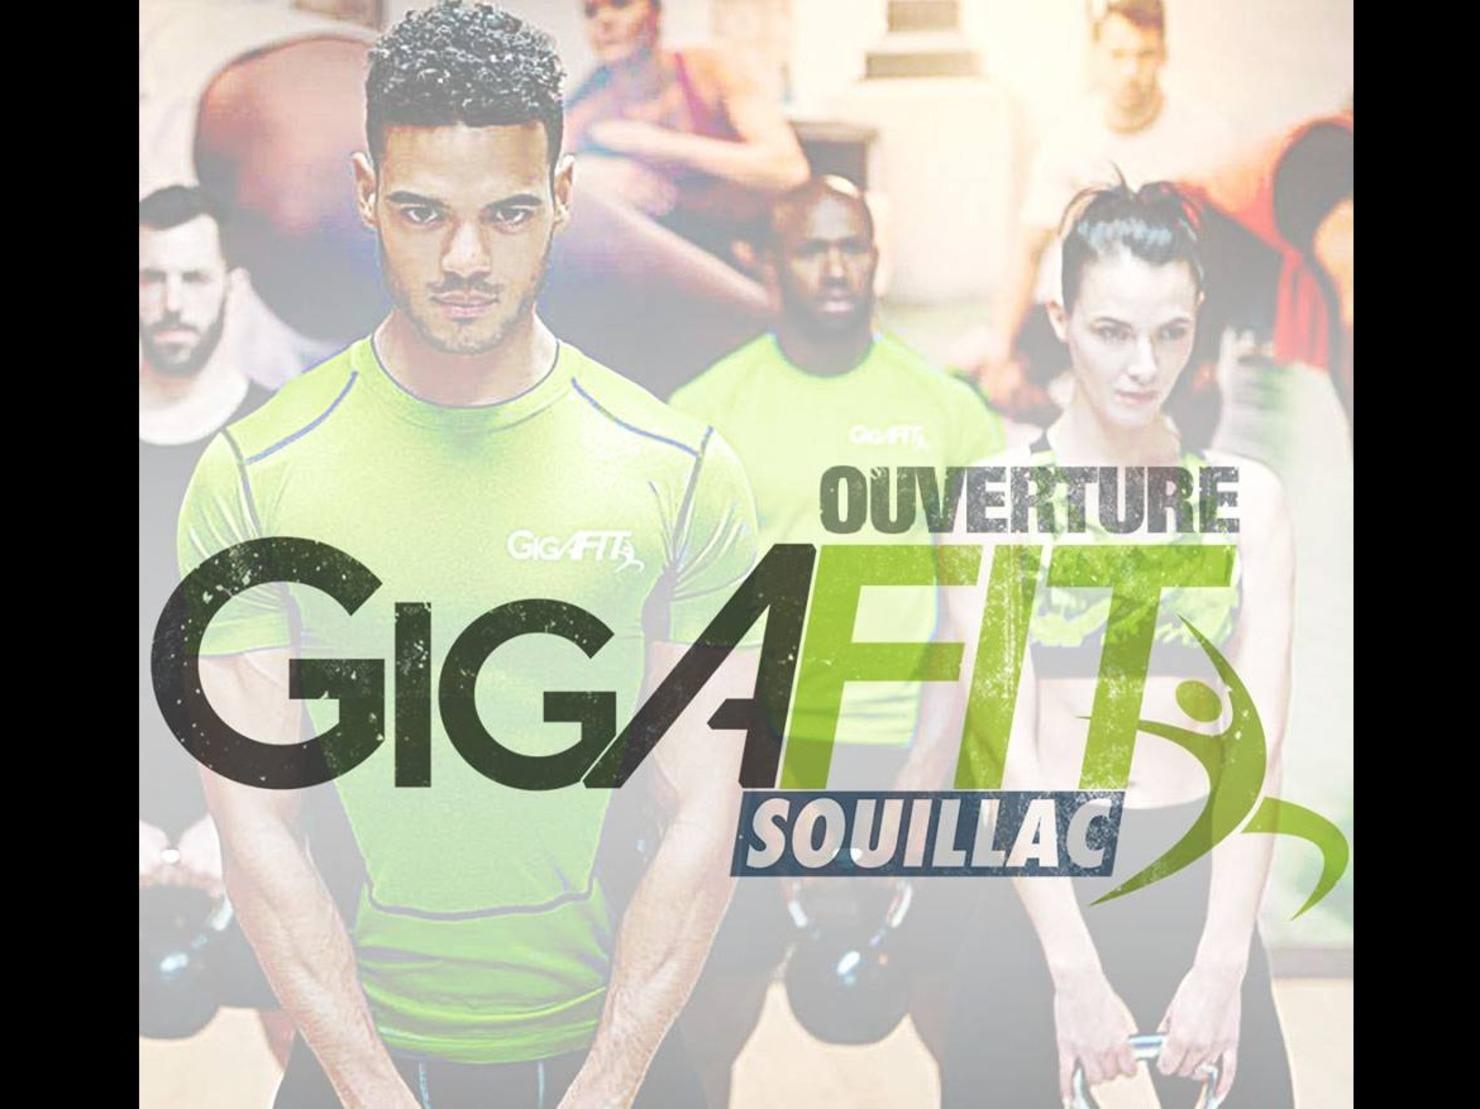 Gigafit Souillac-0